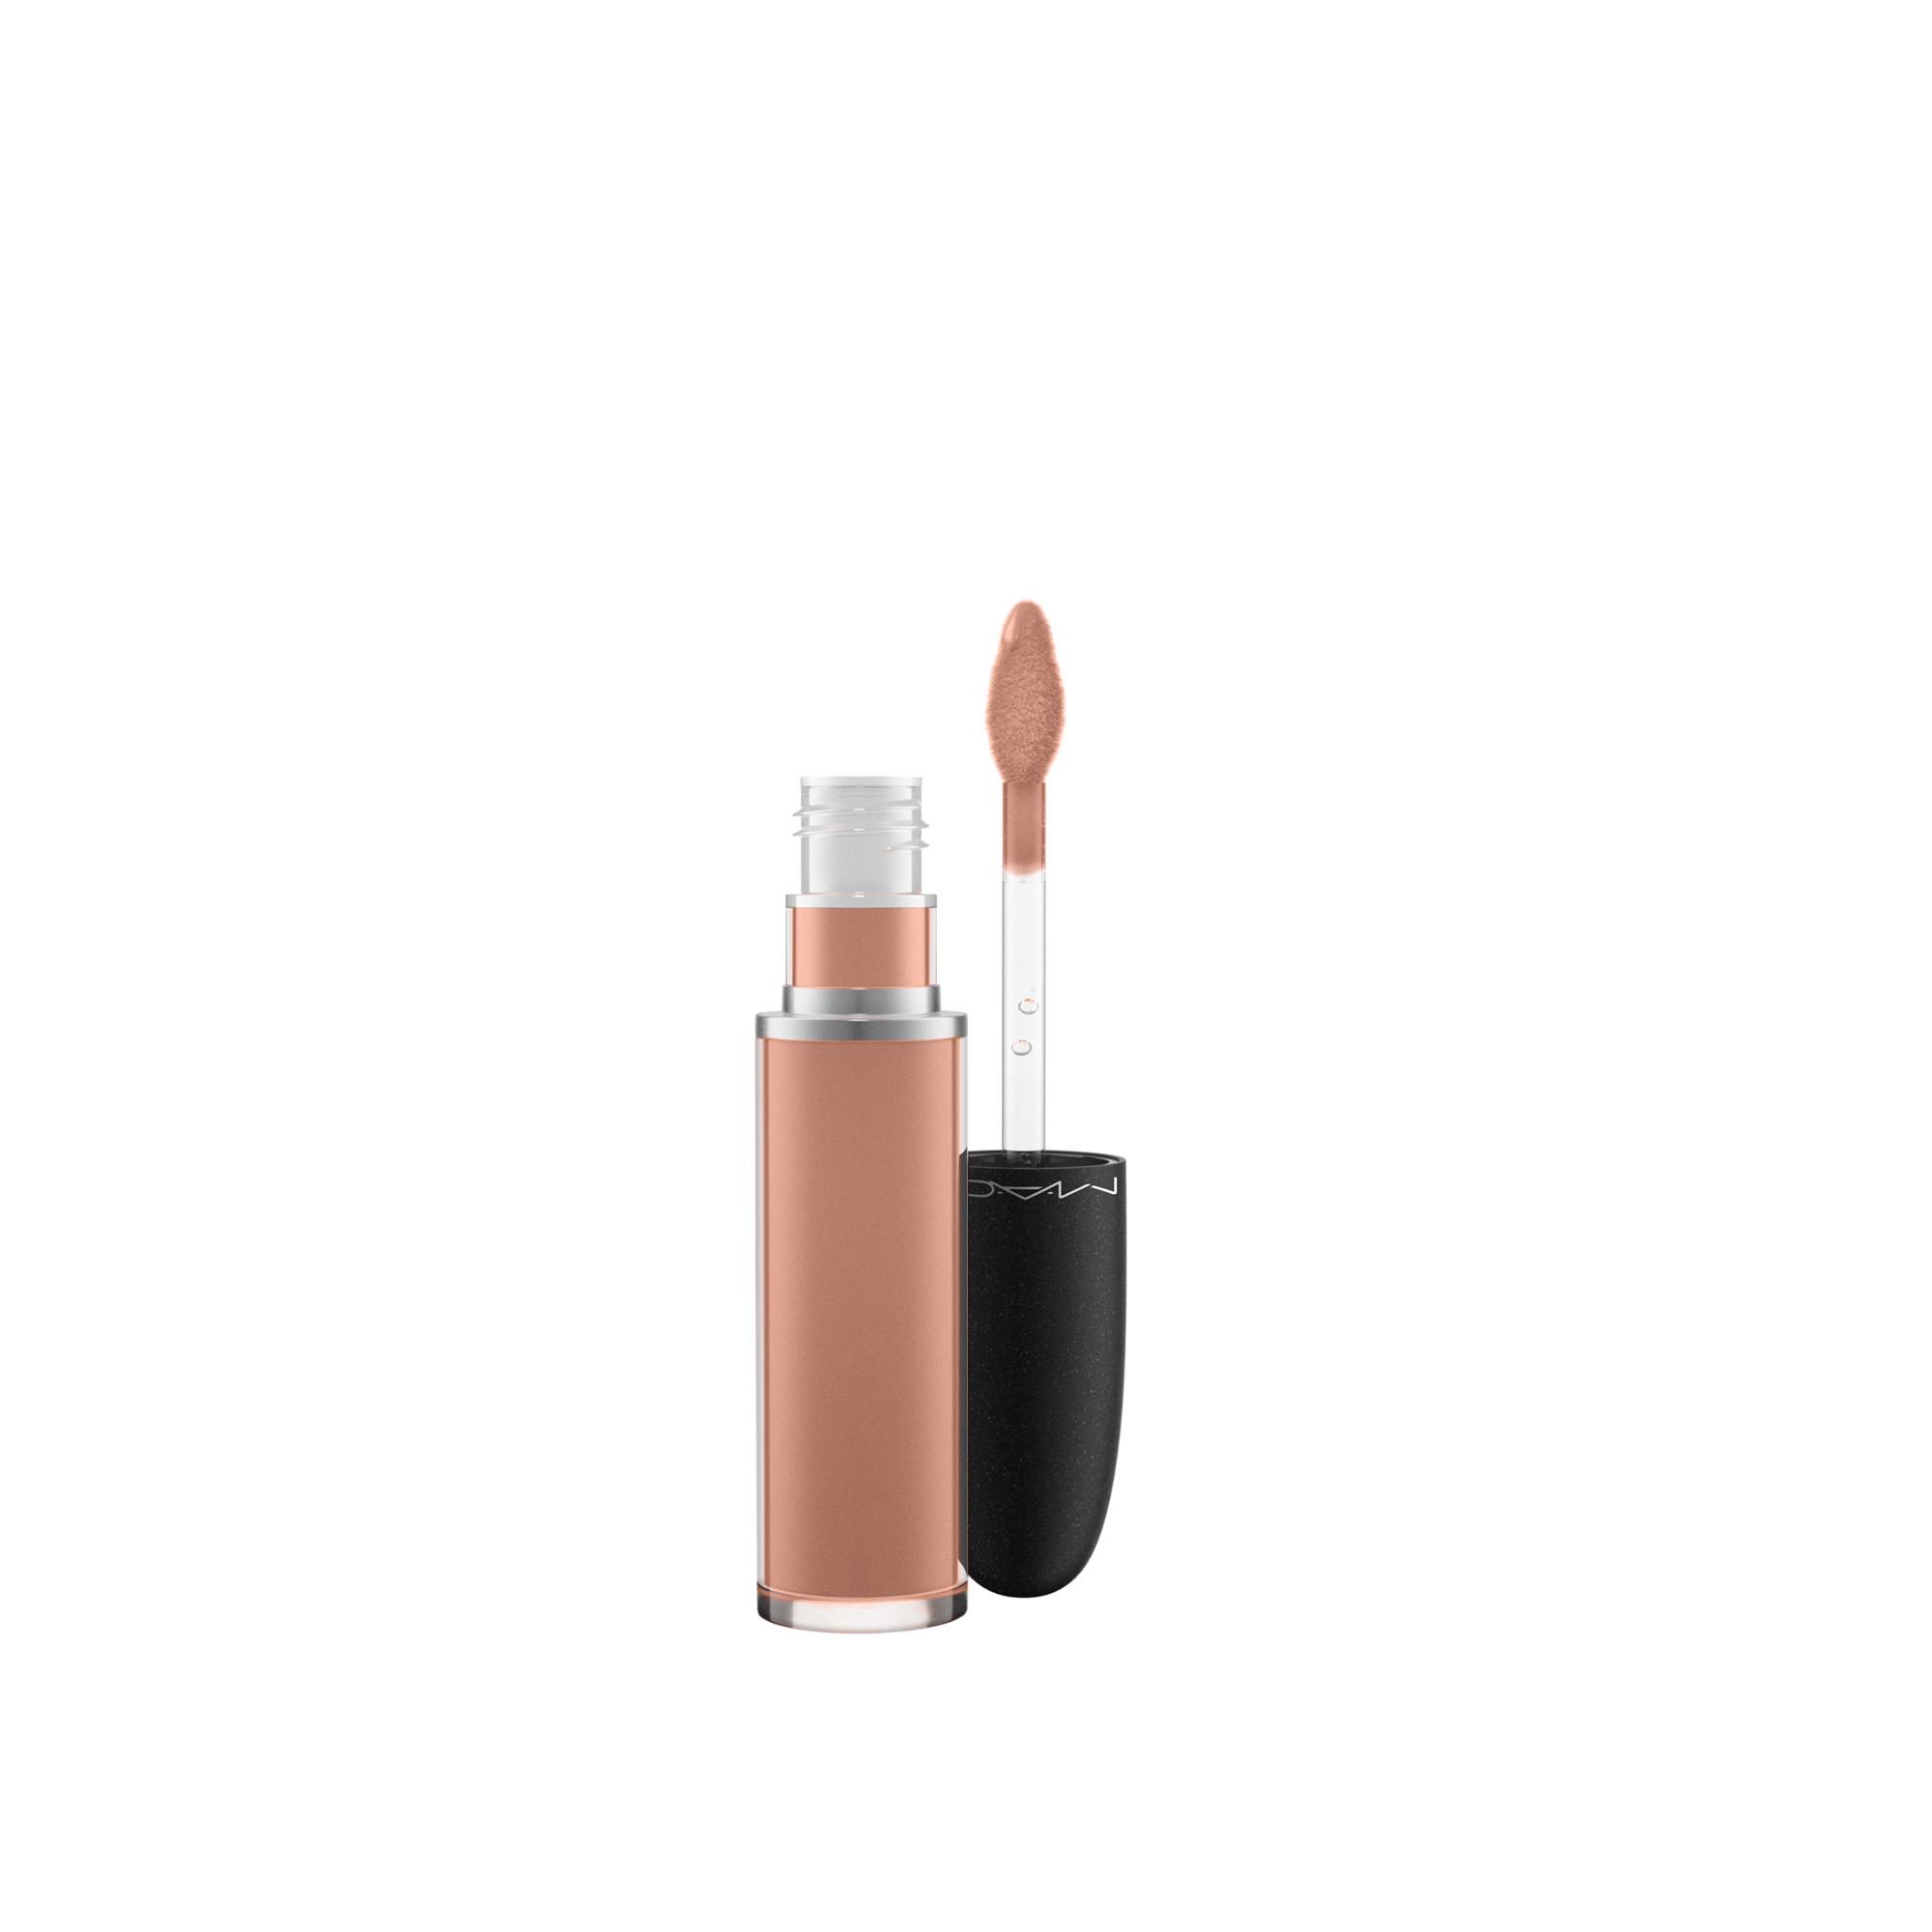 Retro Matte Liquid Lip Colour - Burnt Spice, BURNT SPICE, large image number 0